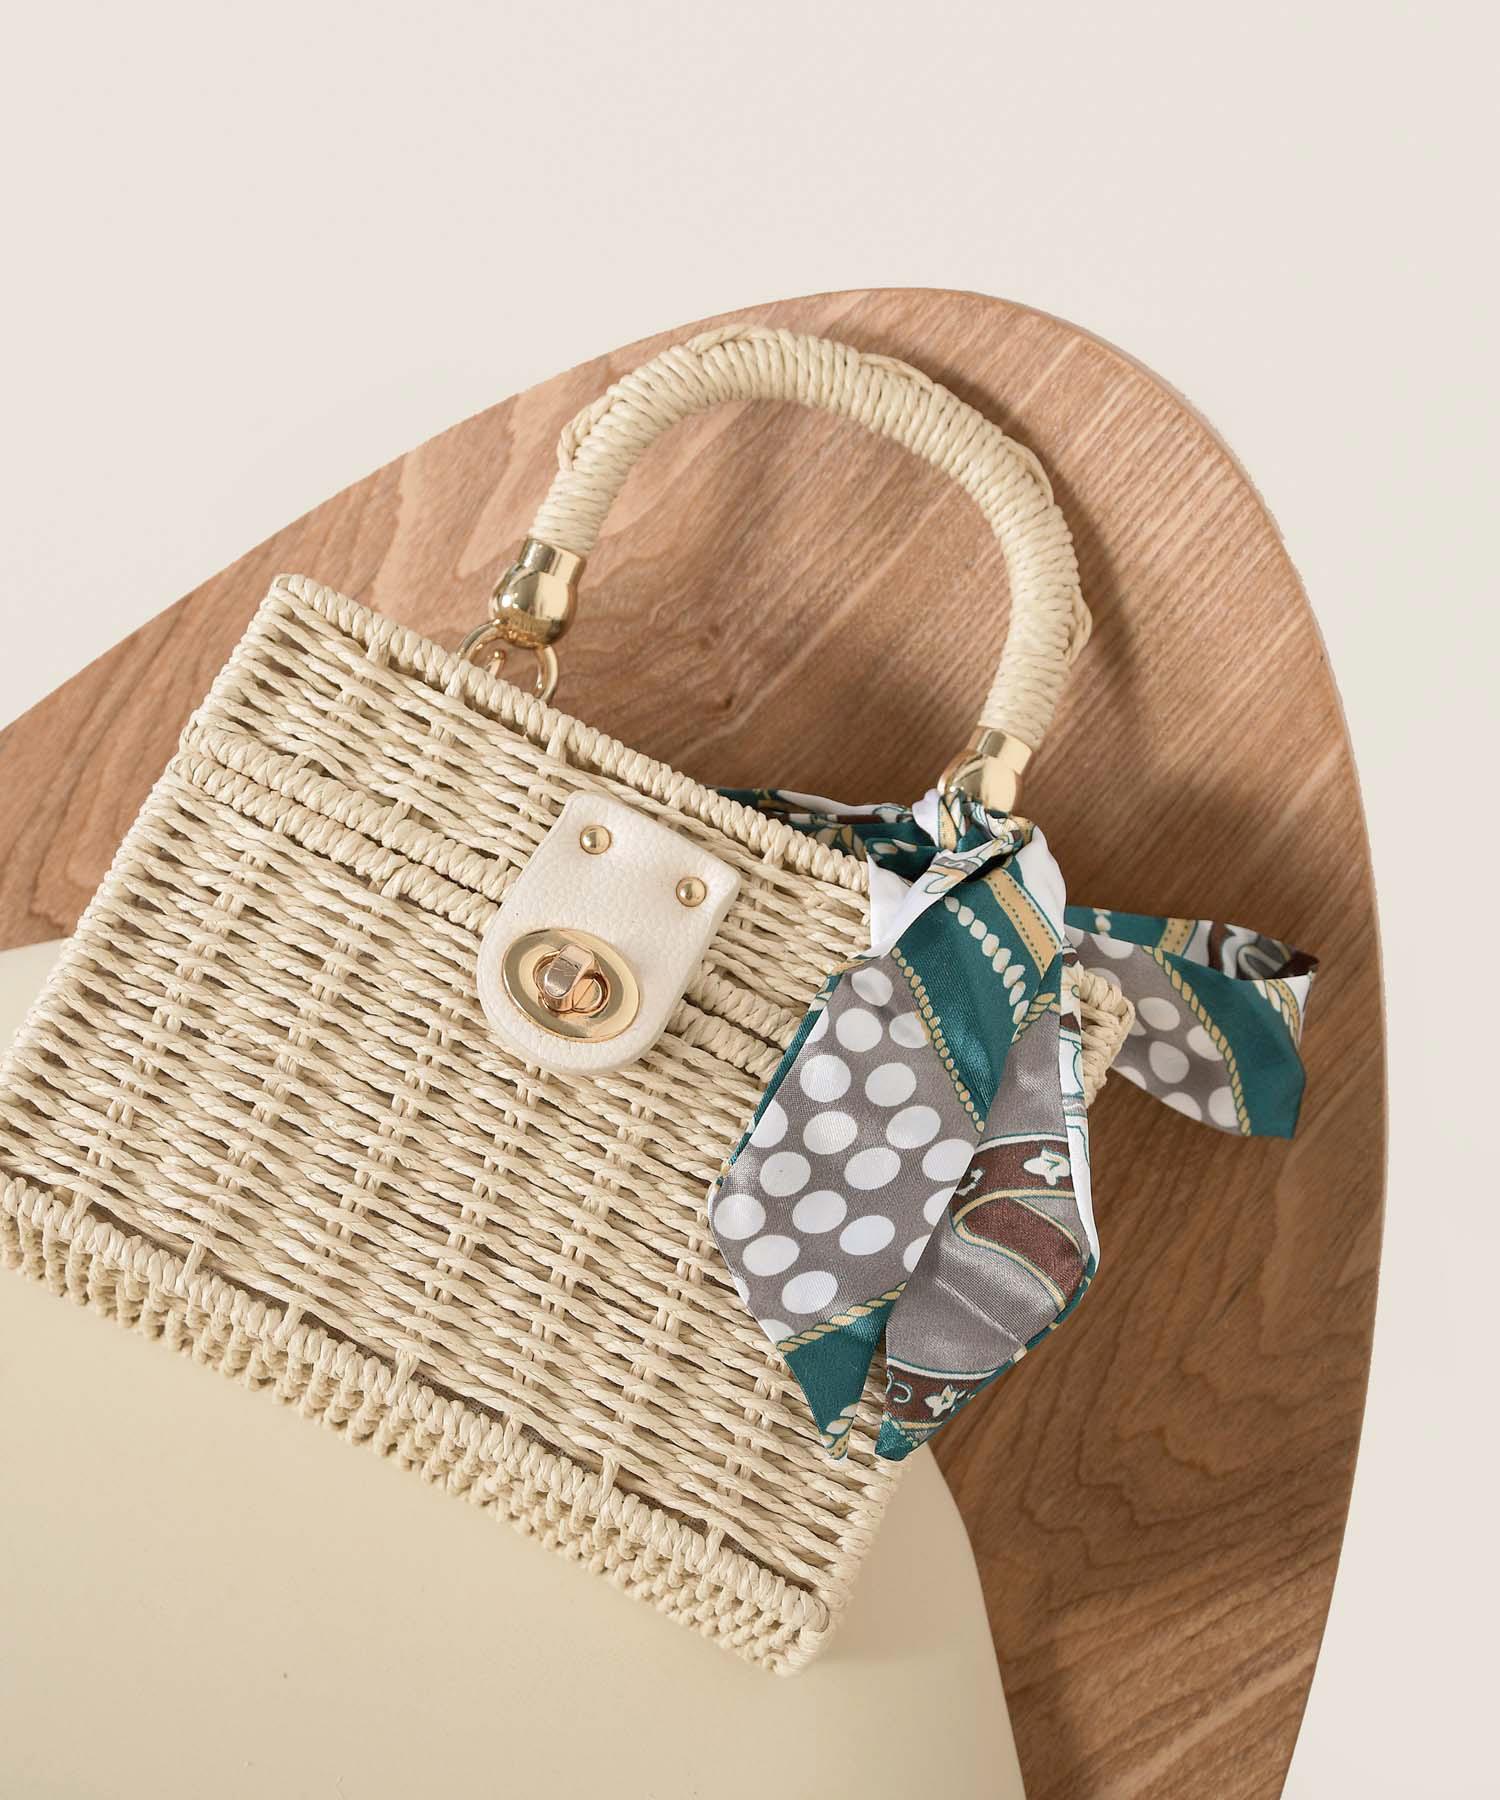 picnic-rattan-box-handbag-natural-1